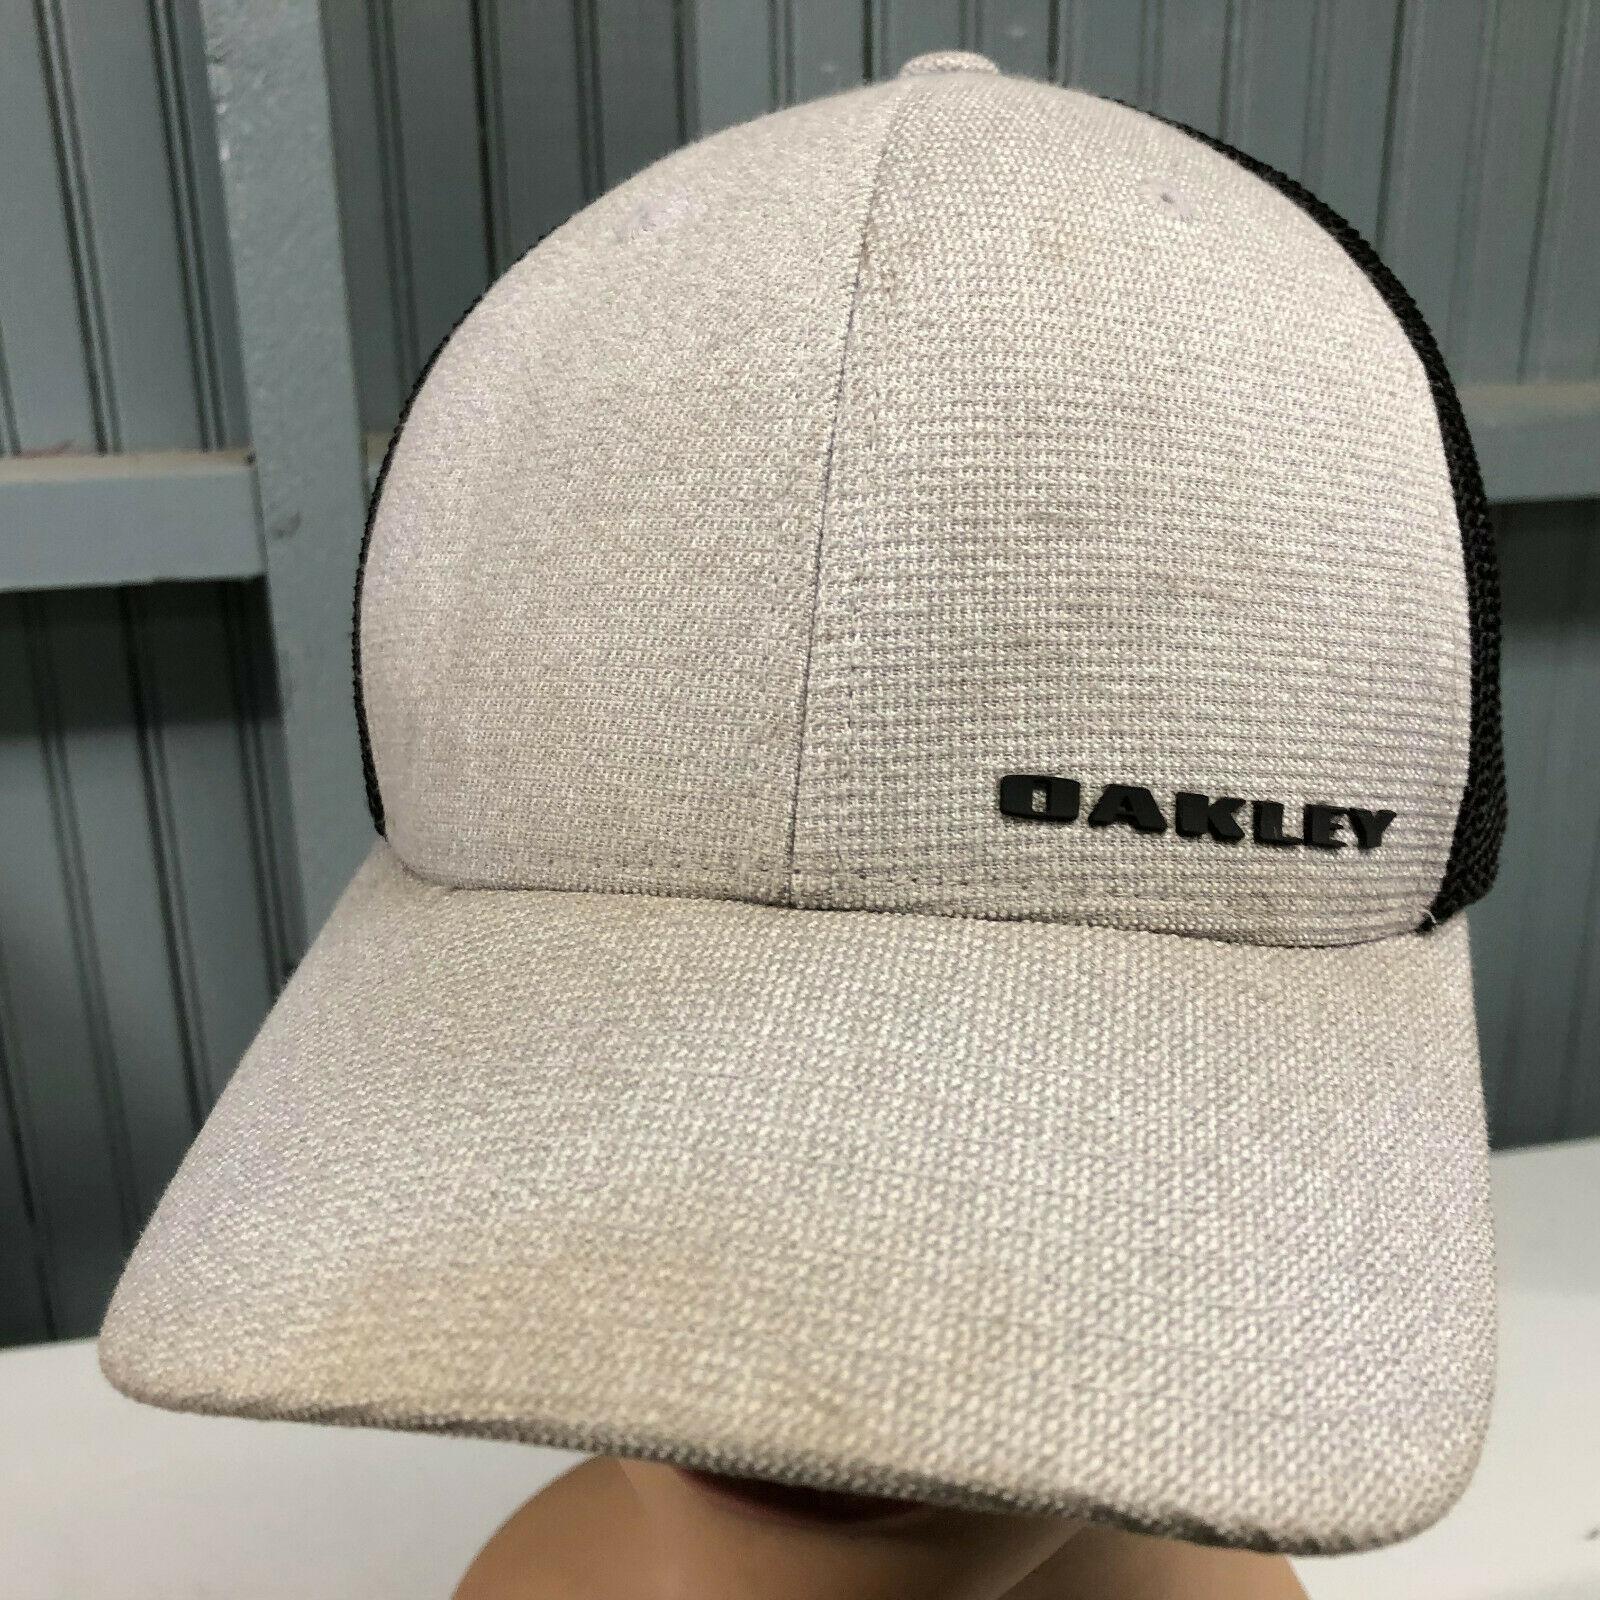 Oakley Stretch Discolored Flexfit Large / XL Baseball Cap Hat